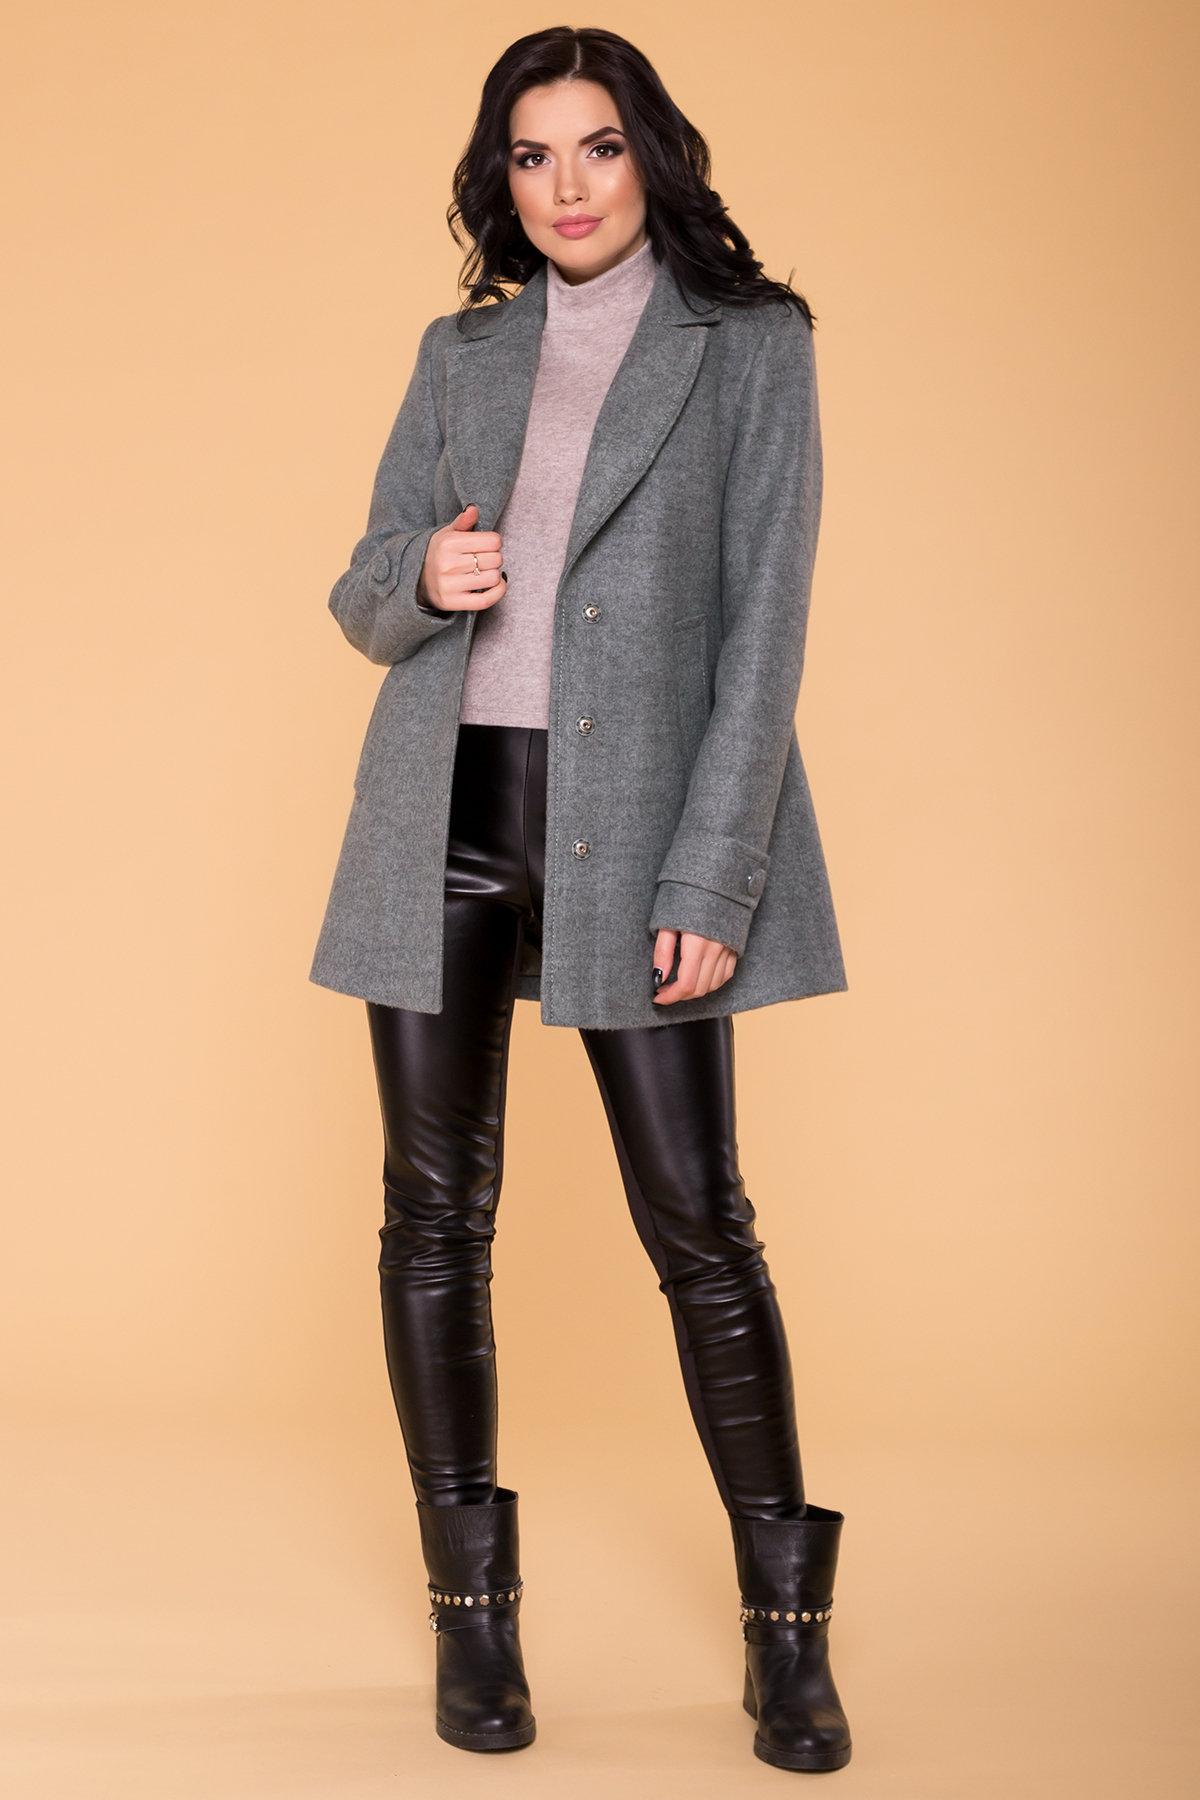 Пальто Нейт 6352 АРТ. 41182 Цвет: Олива - фото 3, интернет магазин tm-modus.ru